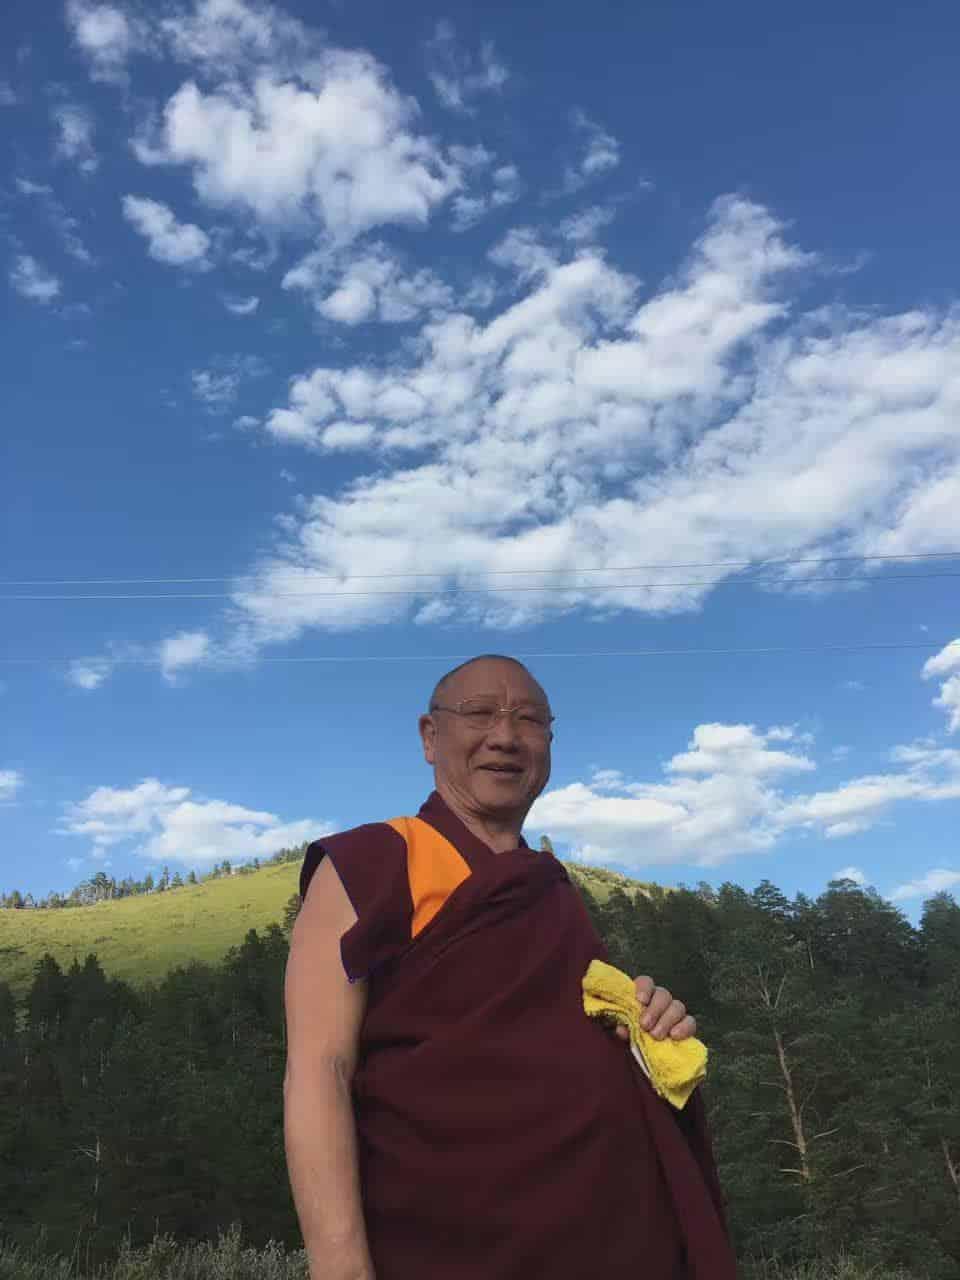 gosok-rinpoche-mongolia-2016-e5f2aa0974e6d83506657c52da3a75d